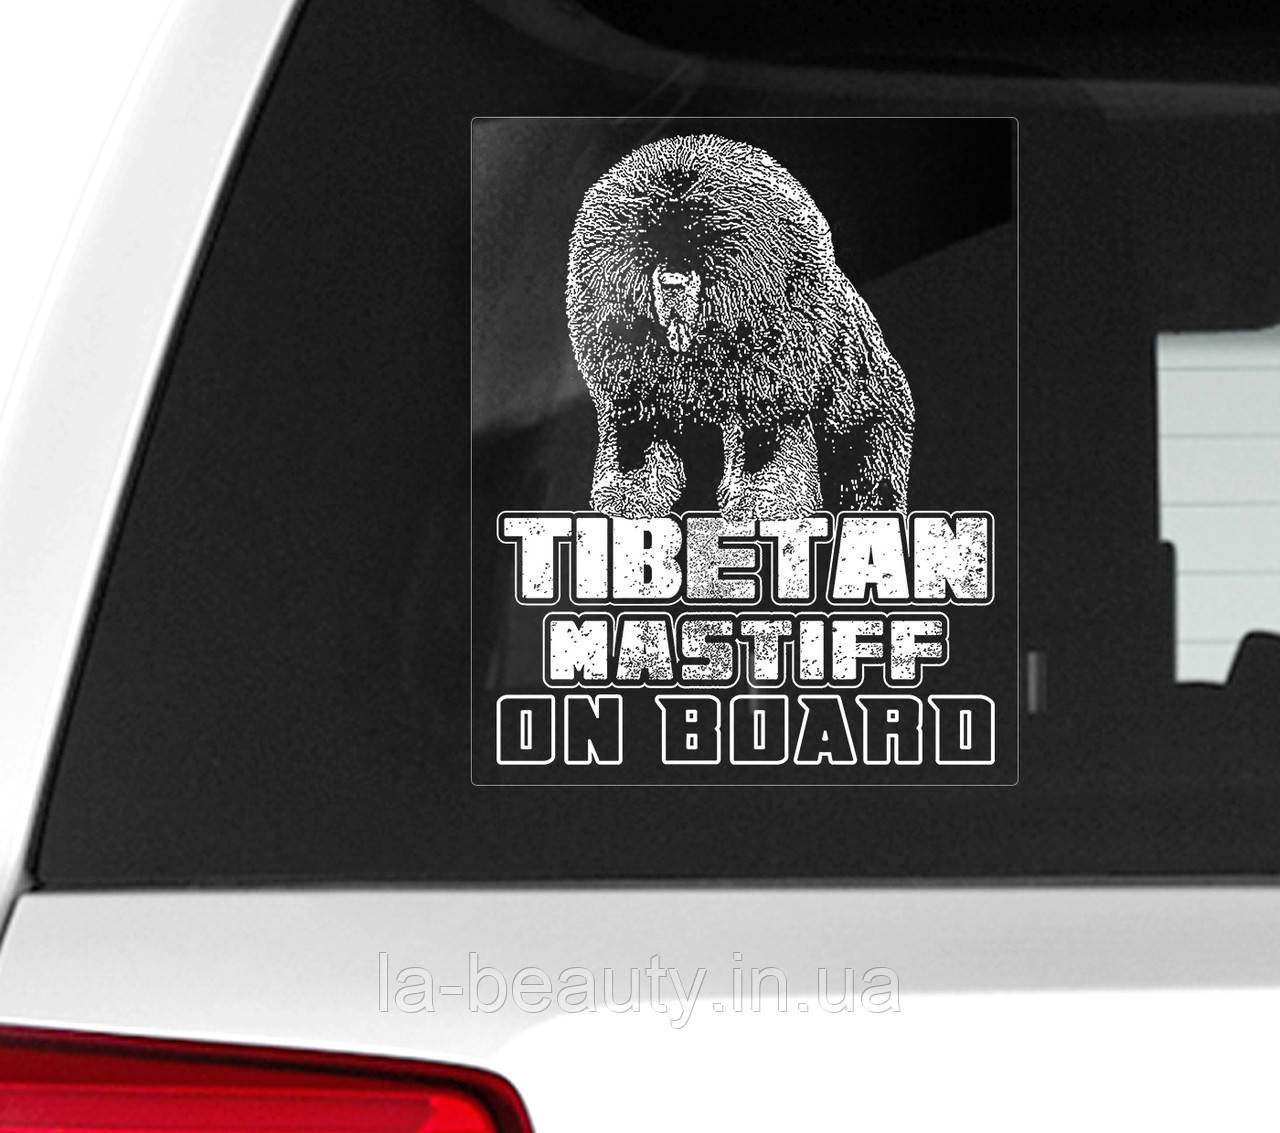 Автомобильная наклейка на стекло Тибетский мастиф на борту-1 (Tibetan Mastiff On Board)